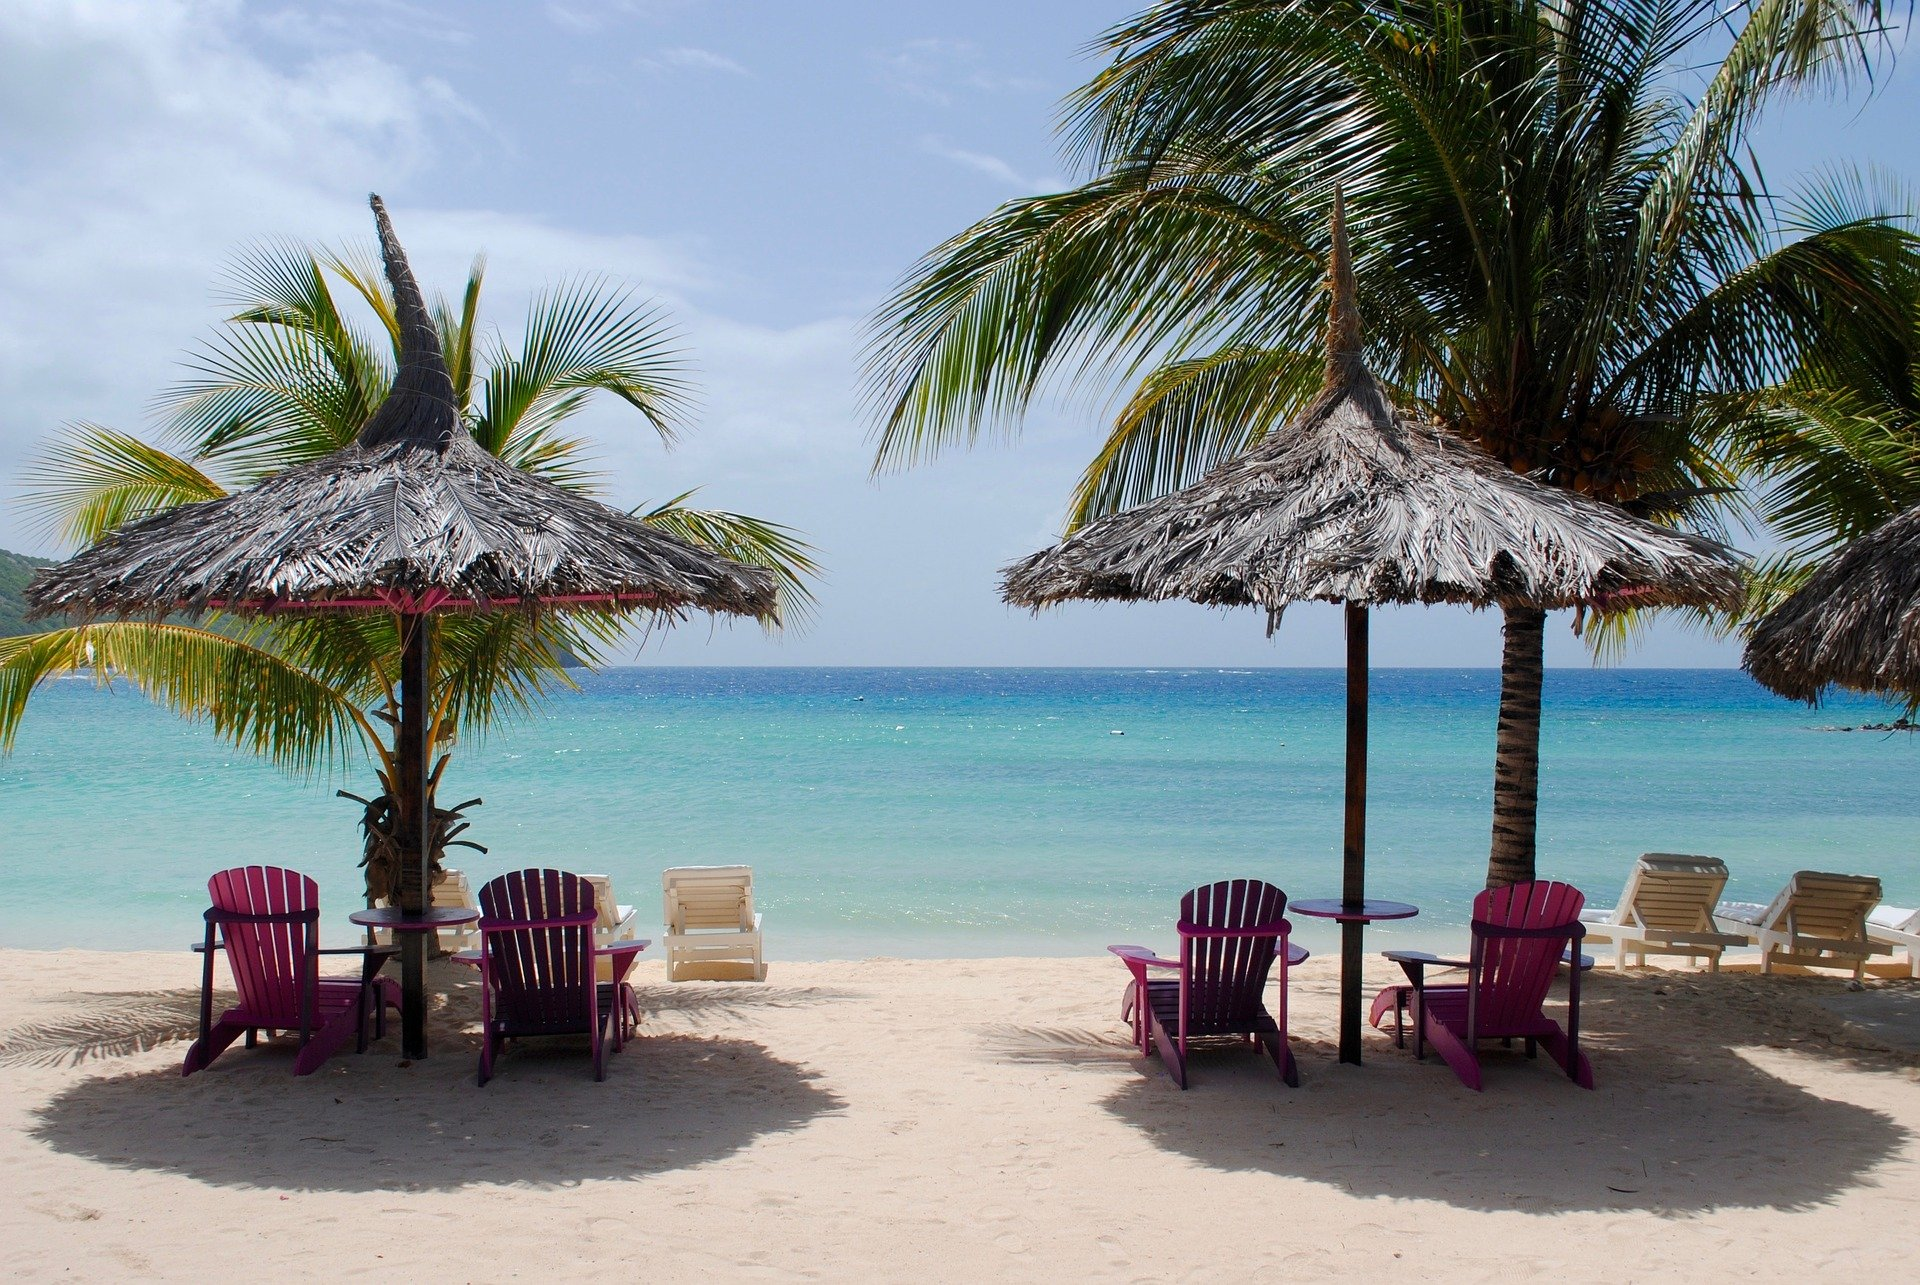 Barcelo feinster Rum aus der Karibik